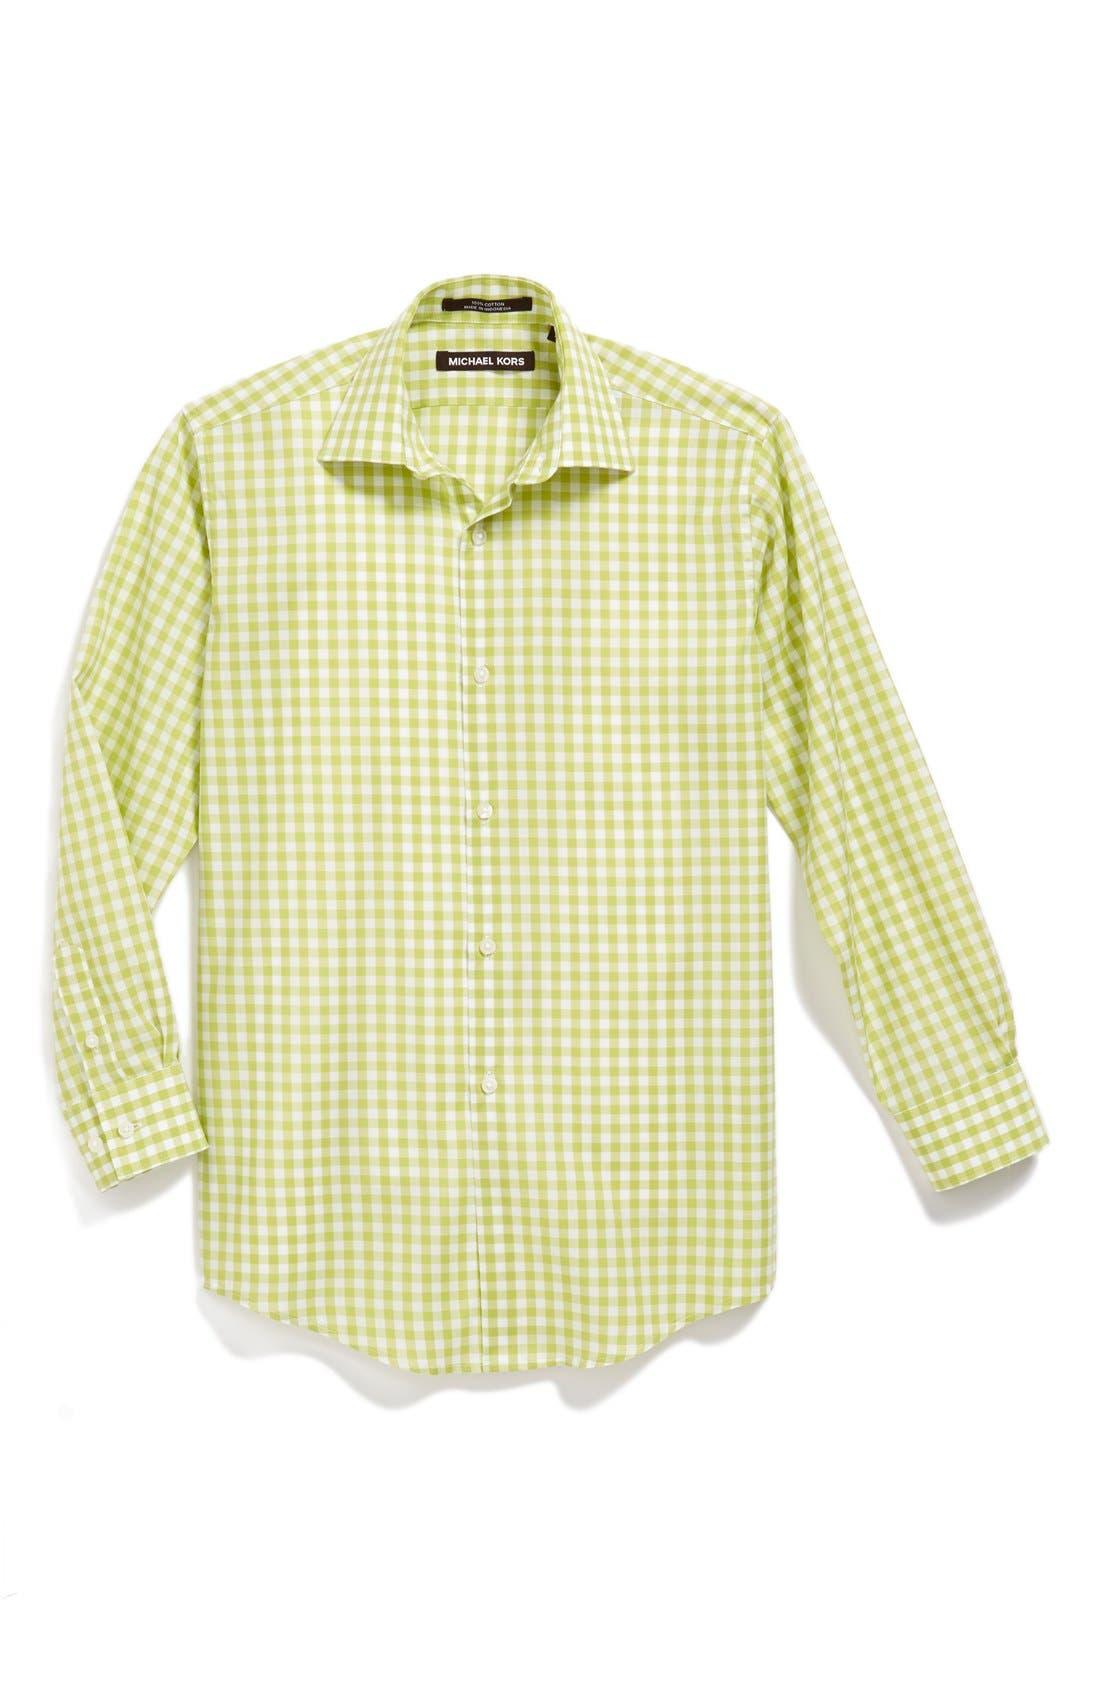 Alternate Image 1 Selected - Michael Kors Gingham Dress Shirt (Big Boys)